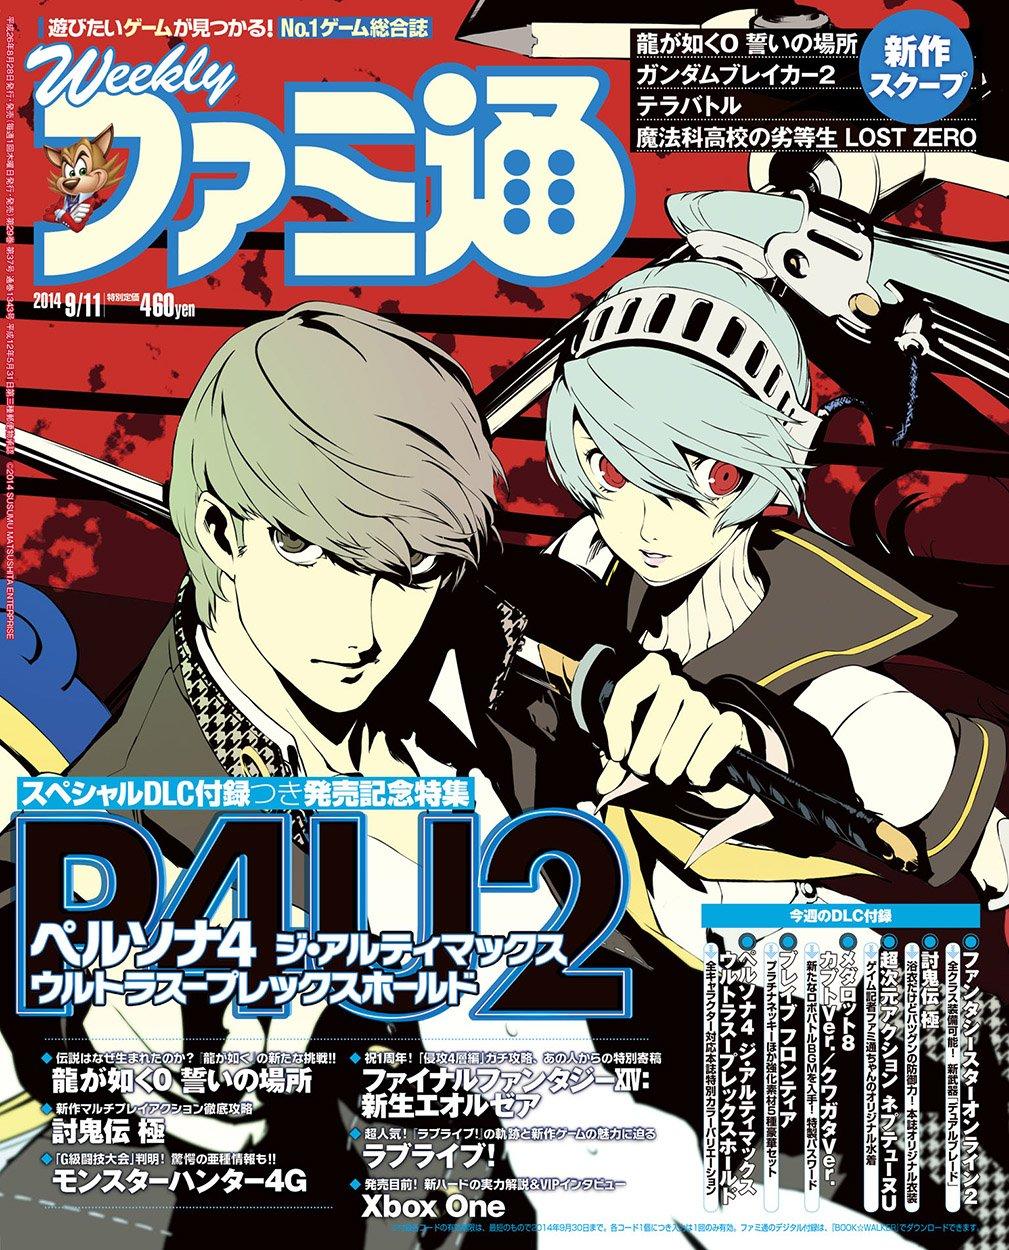 Famitsu 1343 September 11, 2014